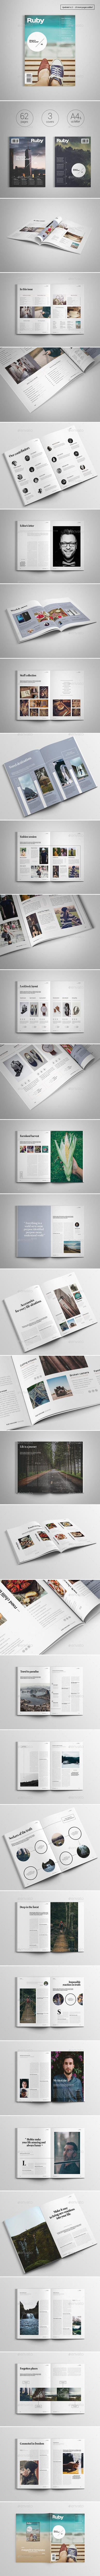 62 Pages Minimal Magazine - Magazines Print Templates